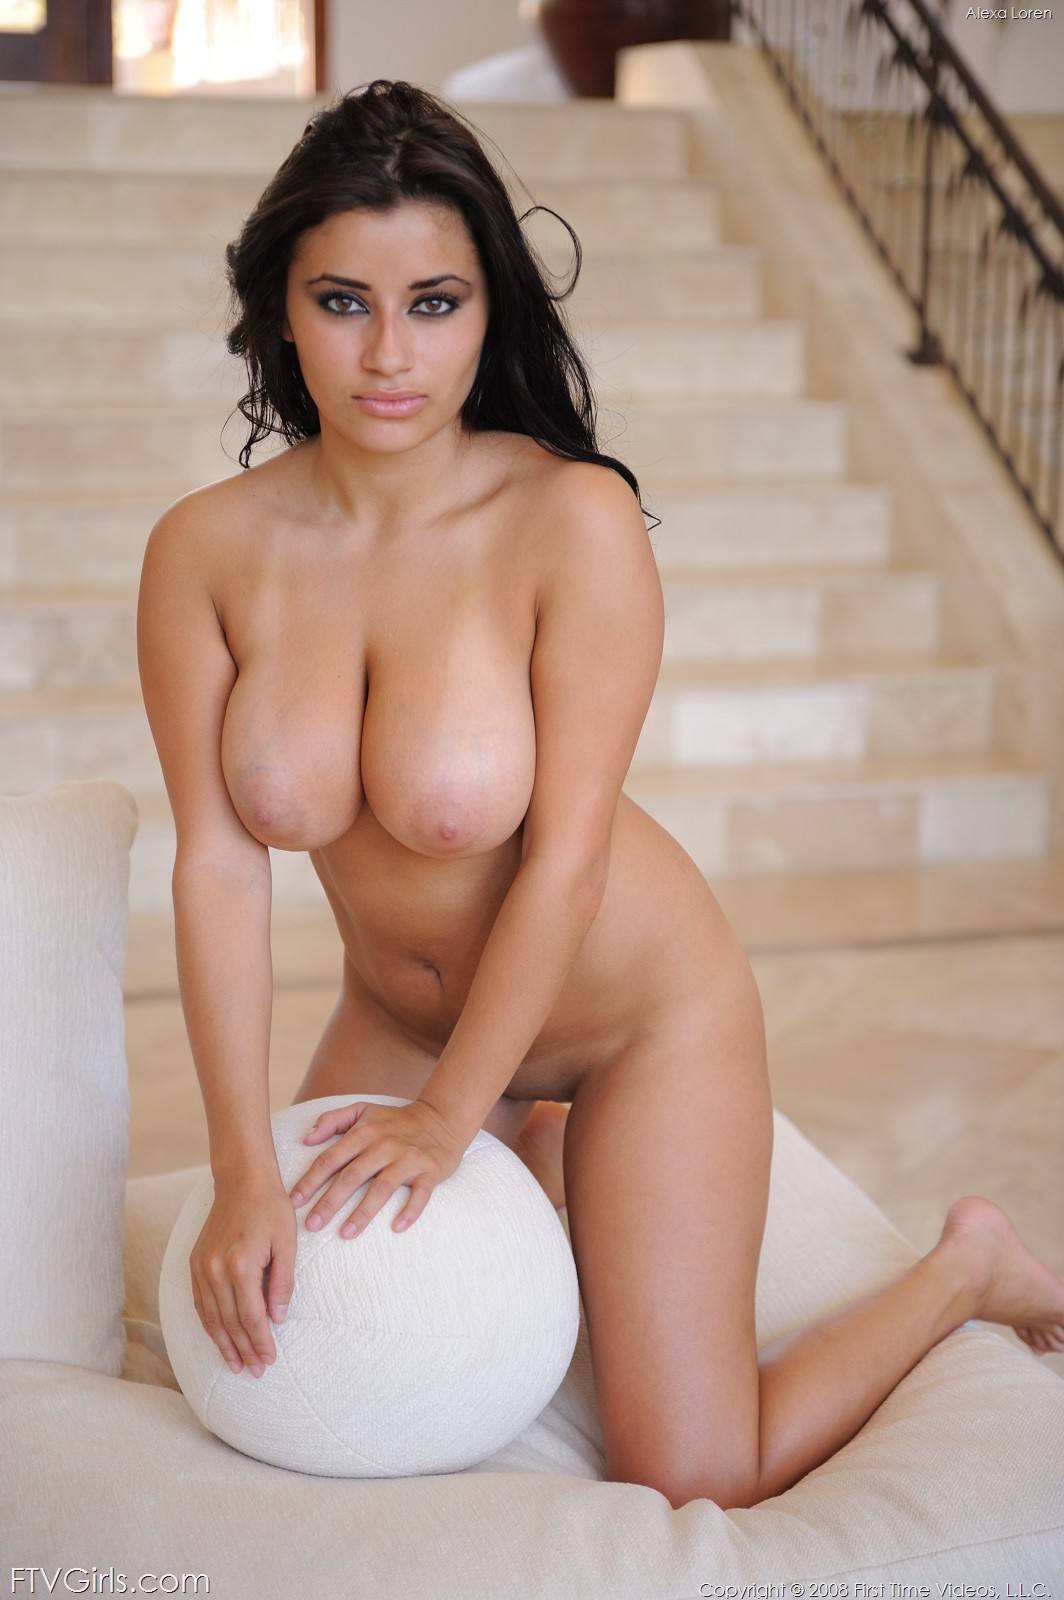 Alexa loren nude hot full, amateur tribbing video